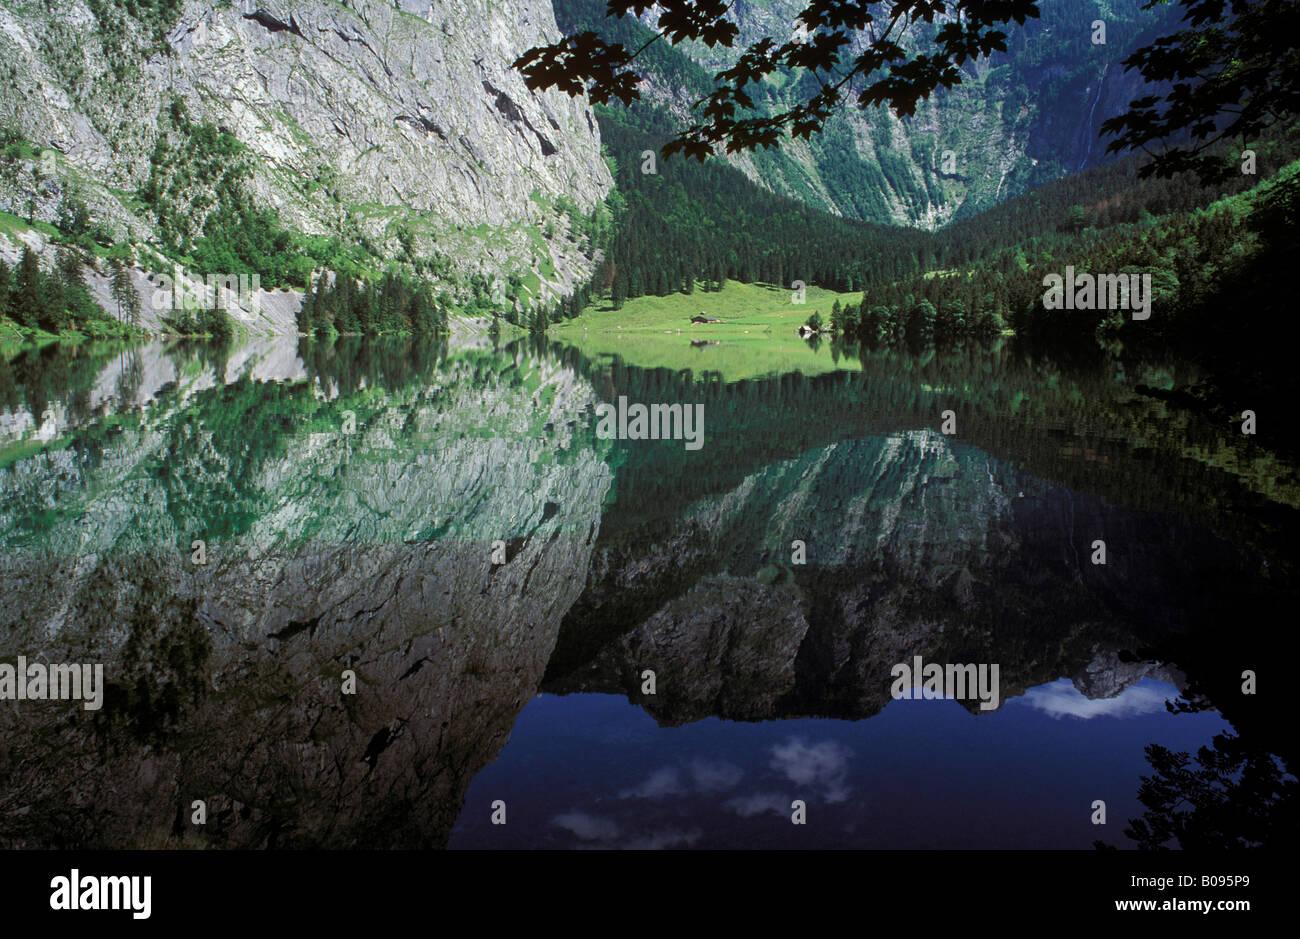 Lake Obersee, Nationalpark Berchtesgaden (Berchtesgaden National Park), Berchtesgadener Alpen (Berchtesgaden Alps), Stock Photo